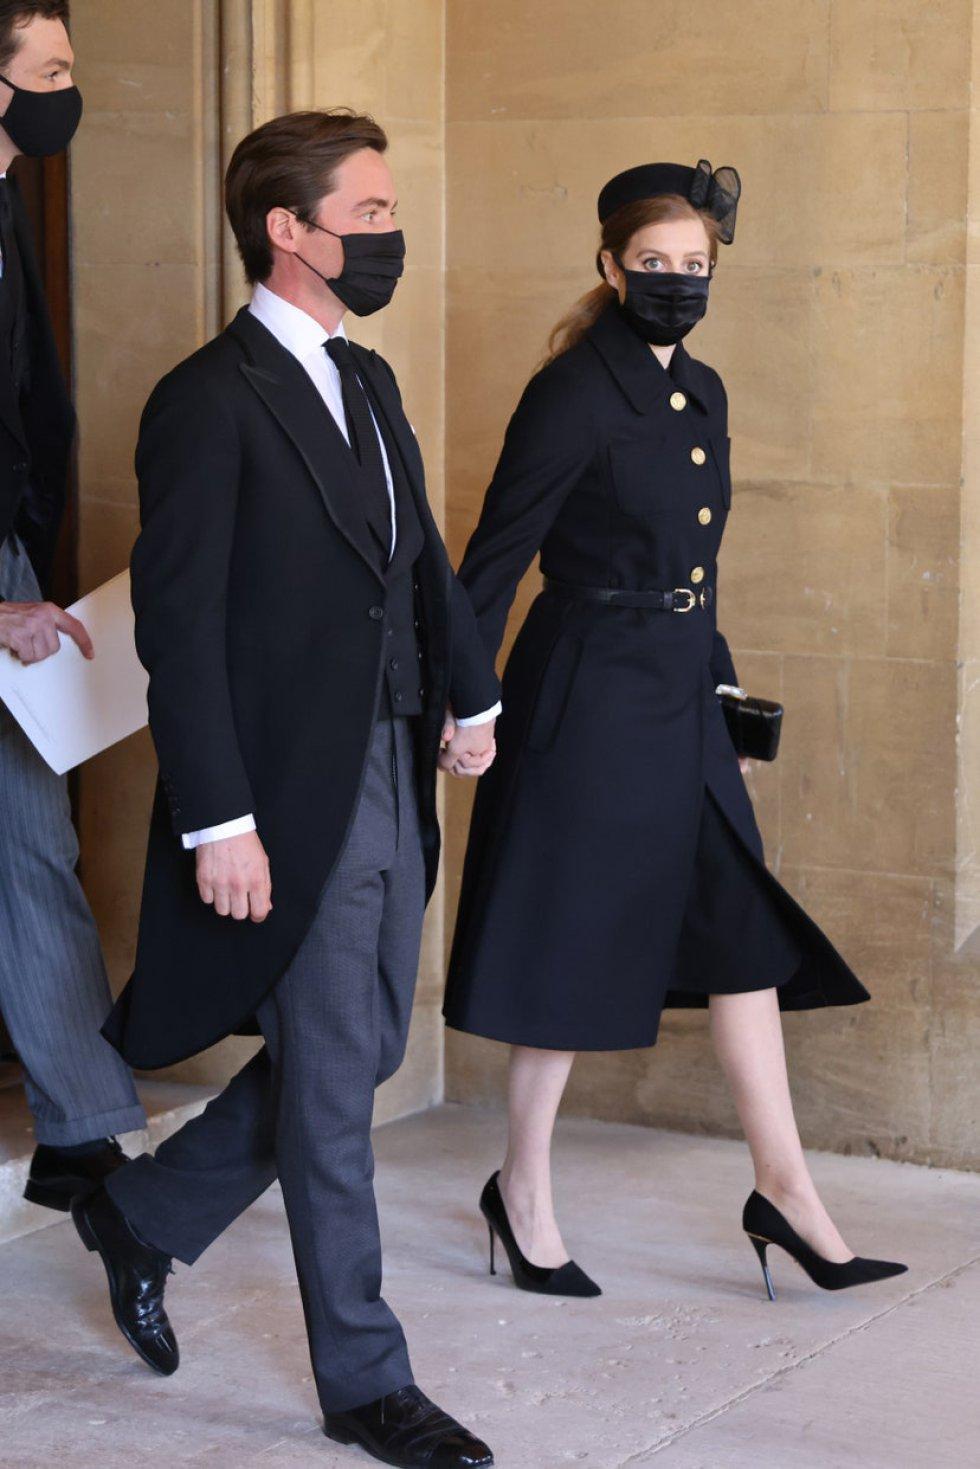 La princesa Beatrice (hija de Andrés y Sarah Fergusson) y Edoardo Mapelli Mozzi, esposo de la princesa Beatrice